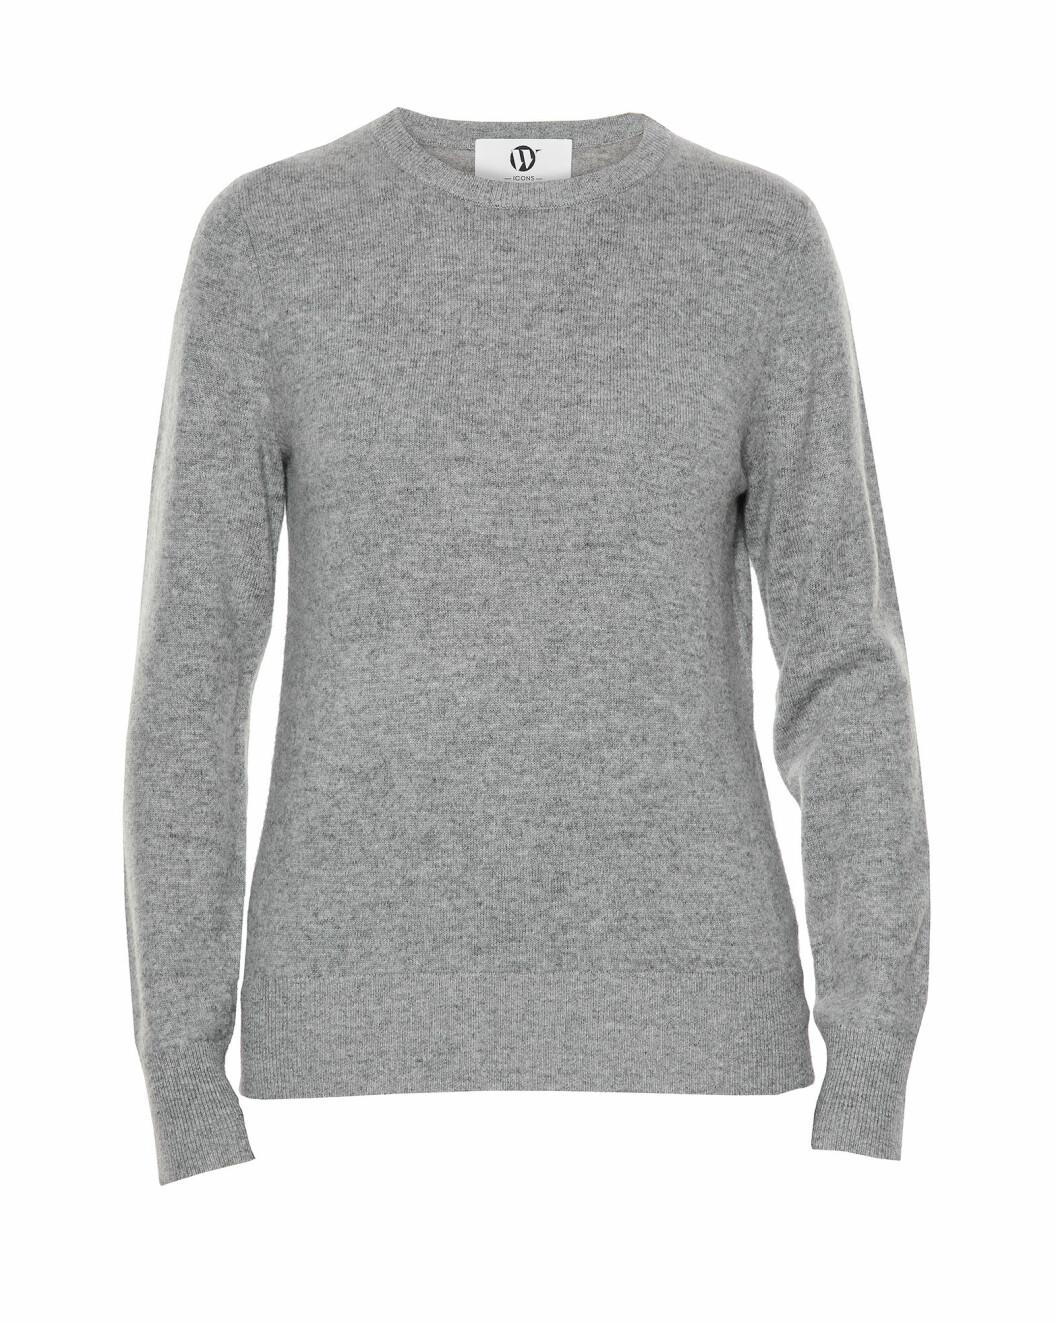 Wakakuu Icons vårkollektion: Grå stickad tröja